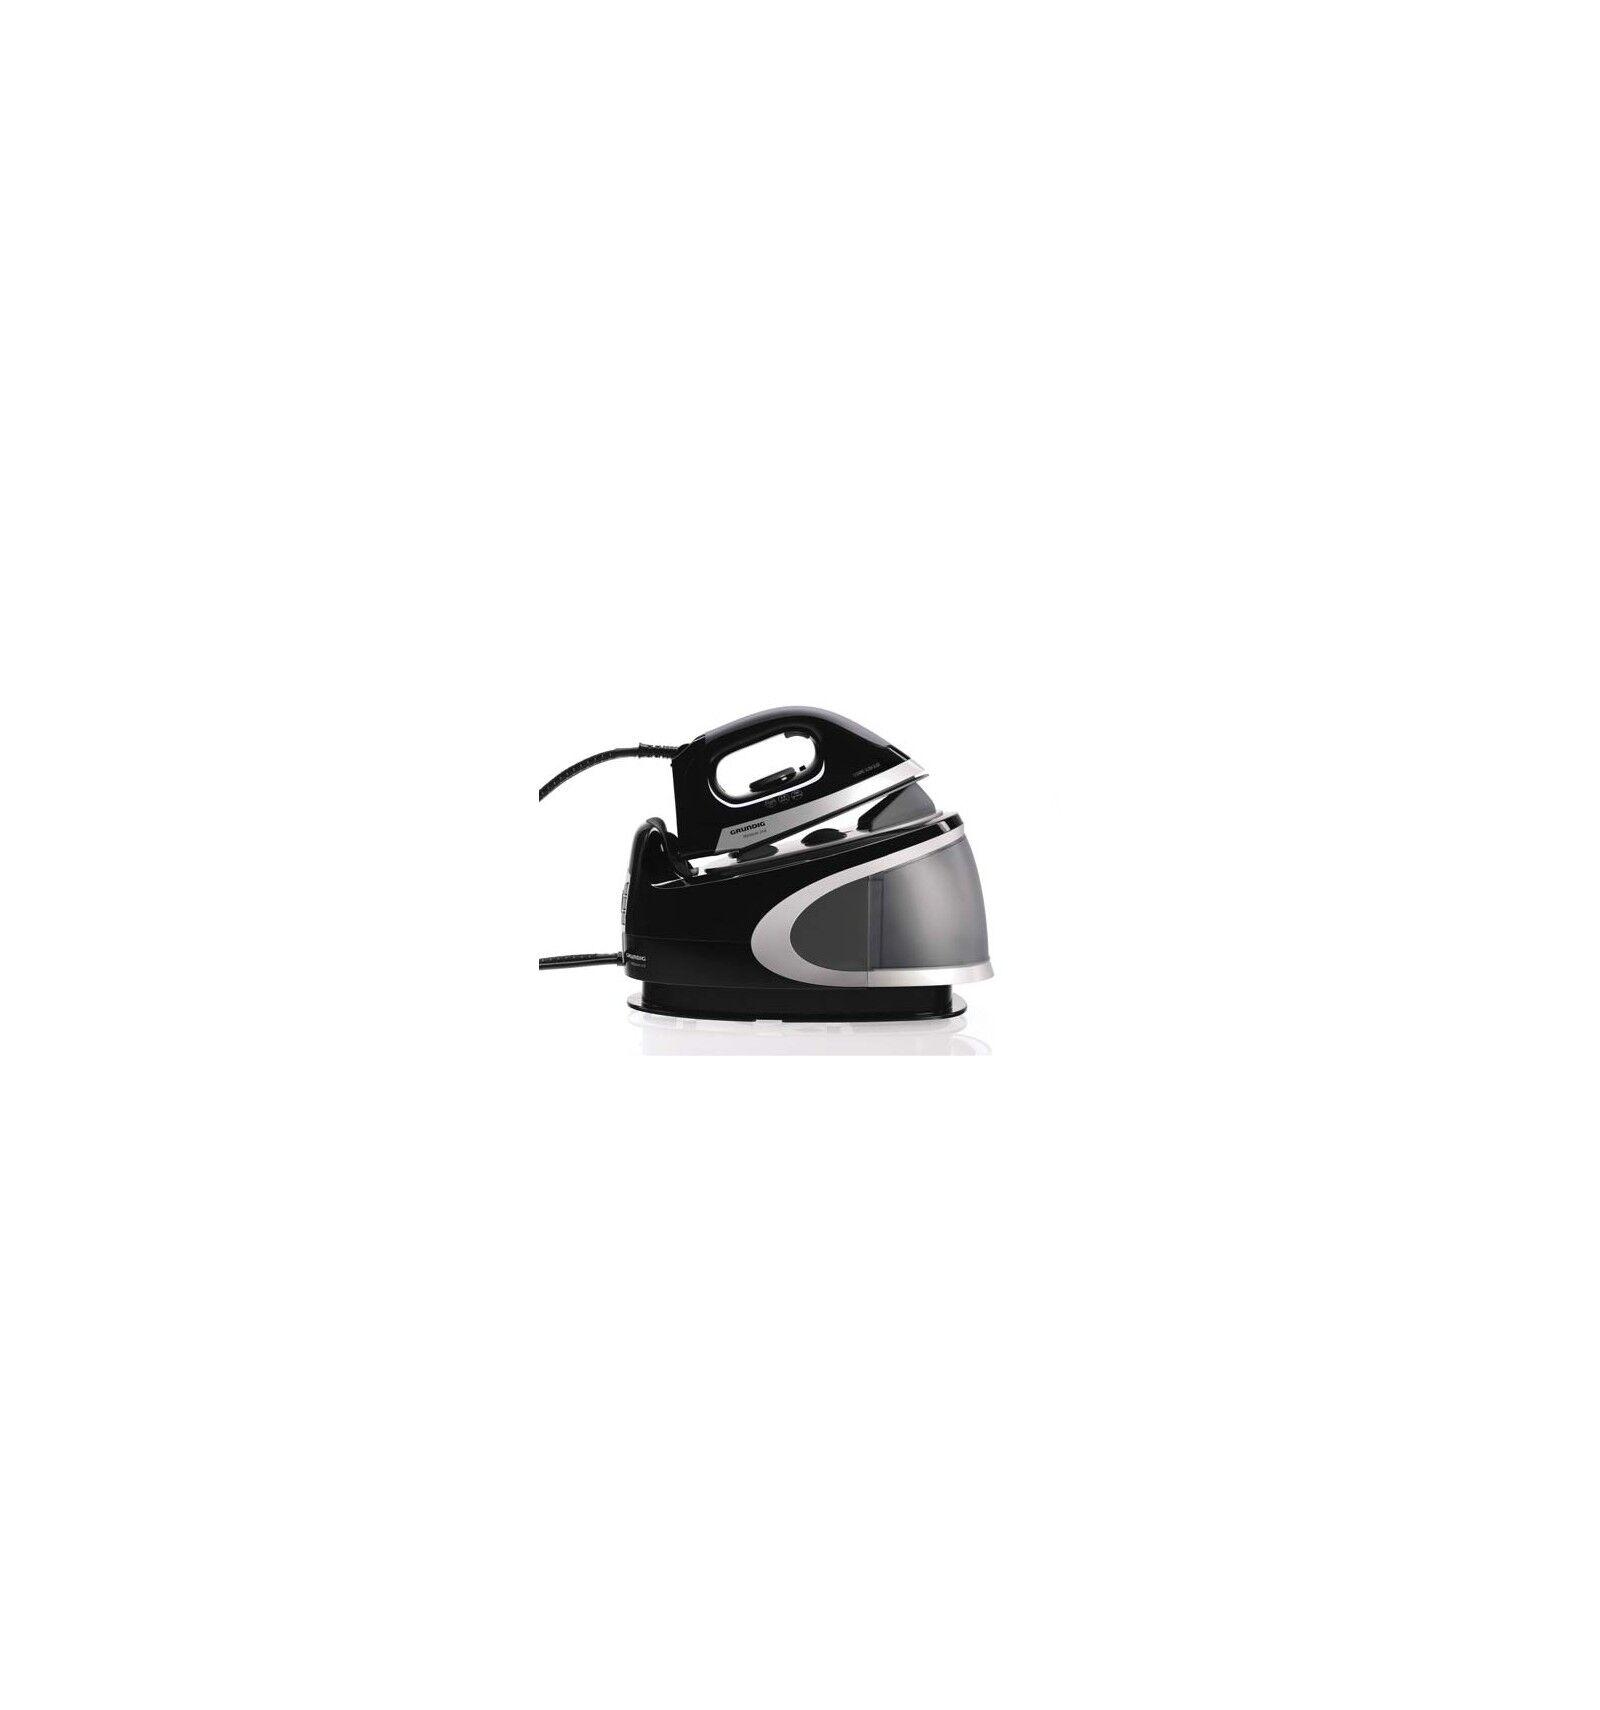 Grundig SIS 8250 100 W 1,7 L Keraaminen pohjalevy Musta, Hopea